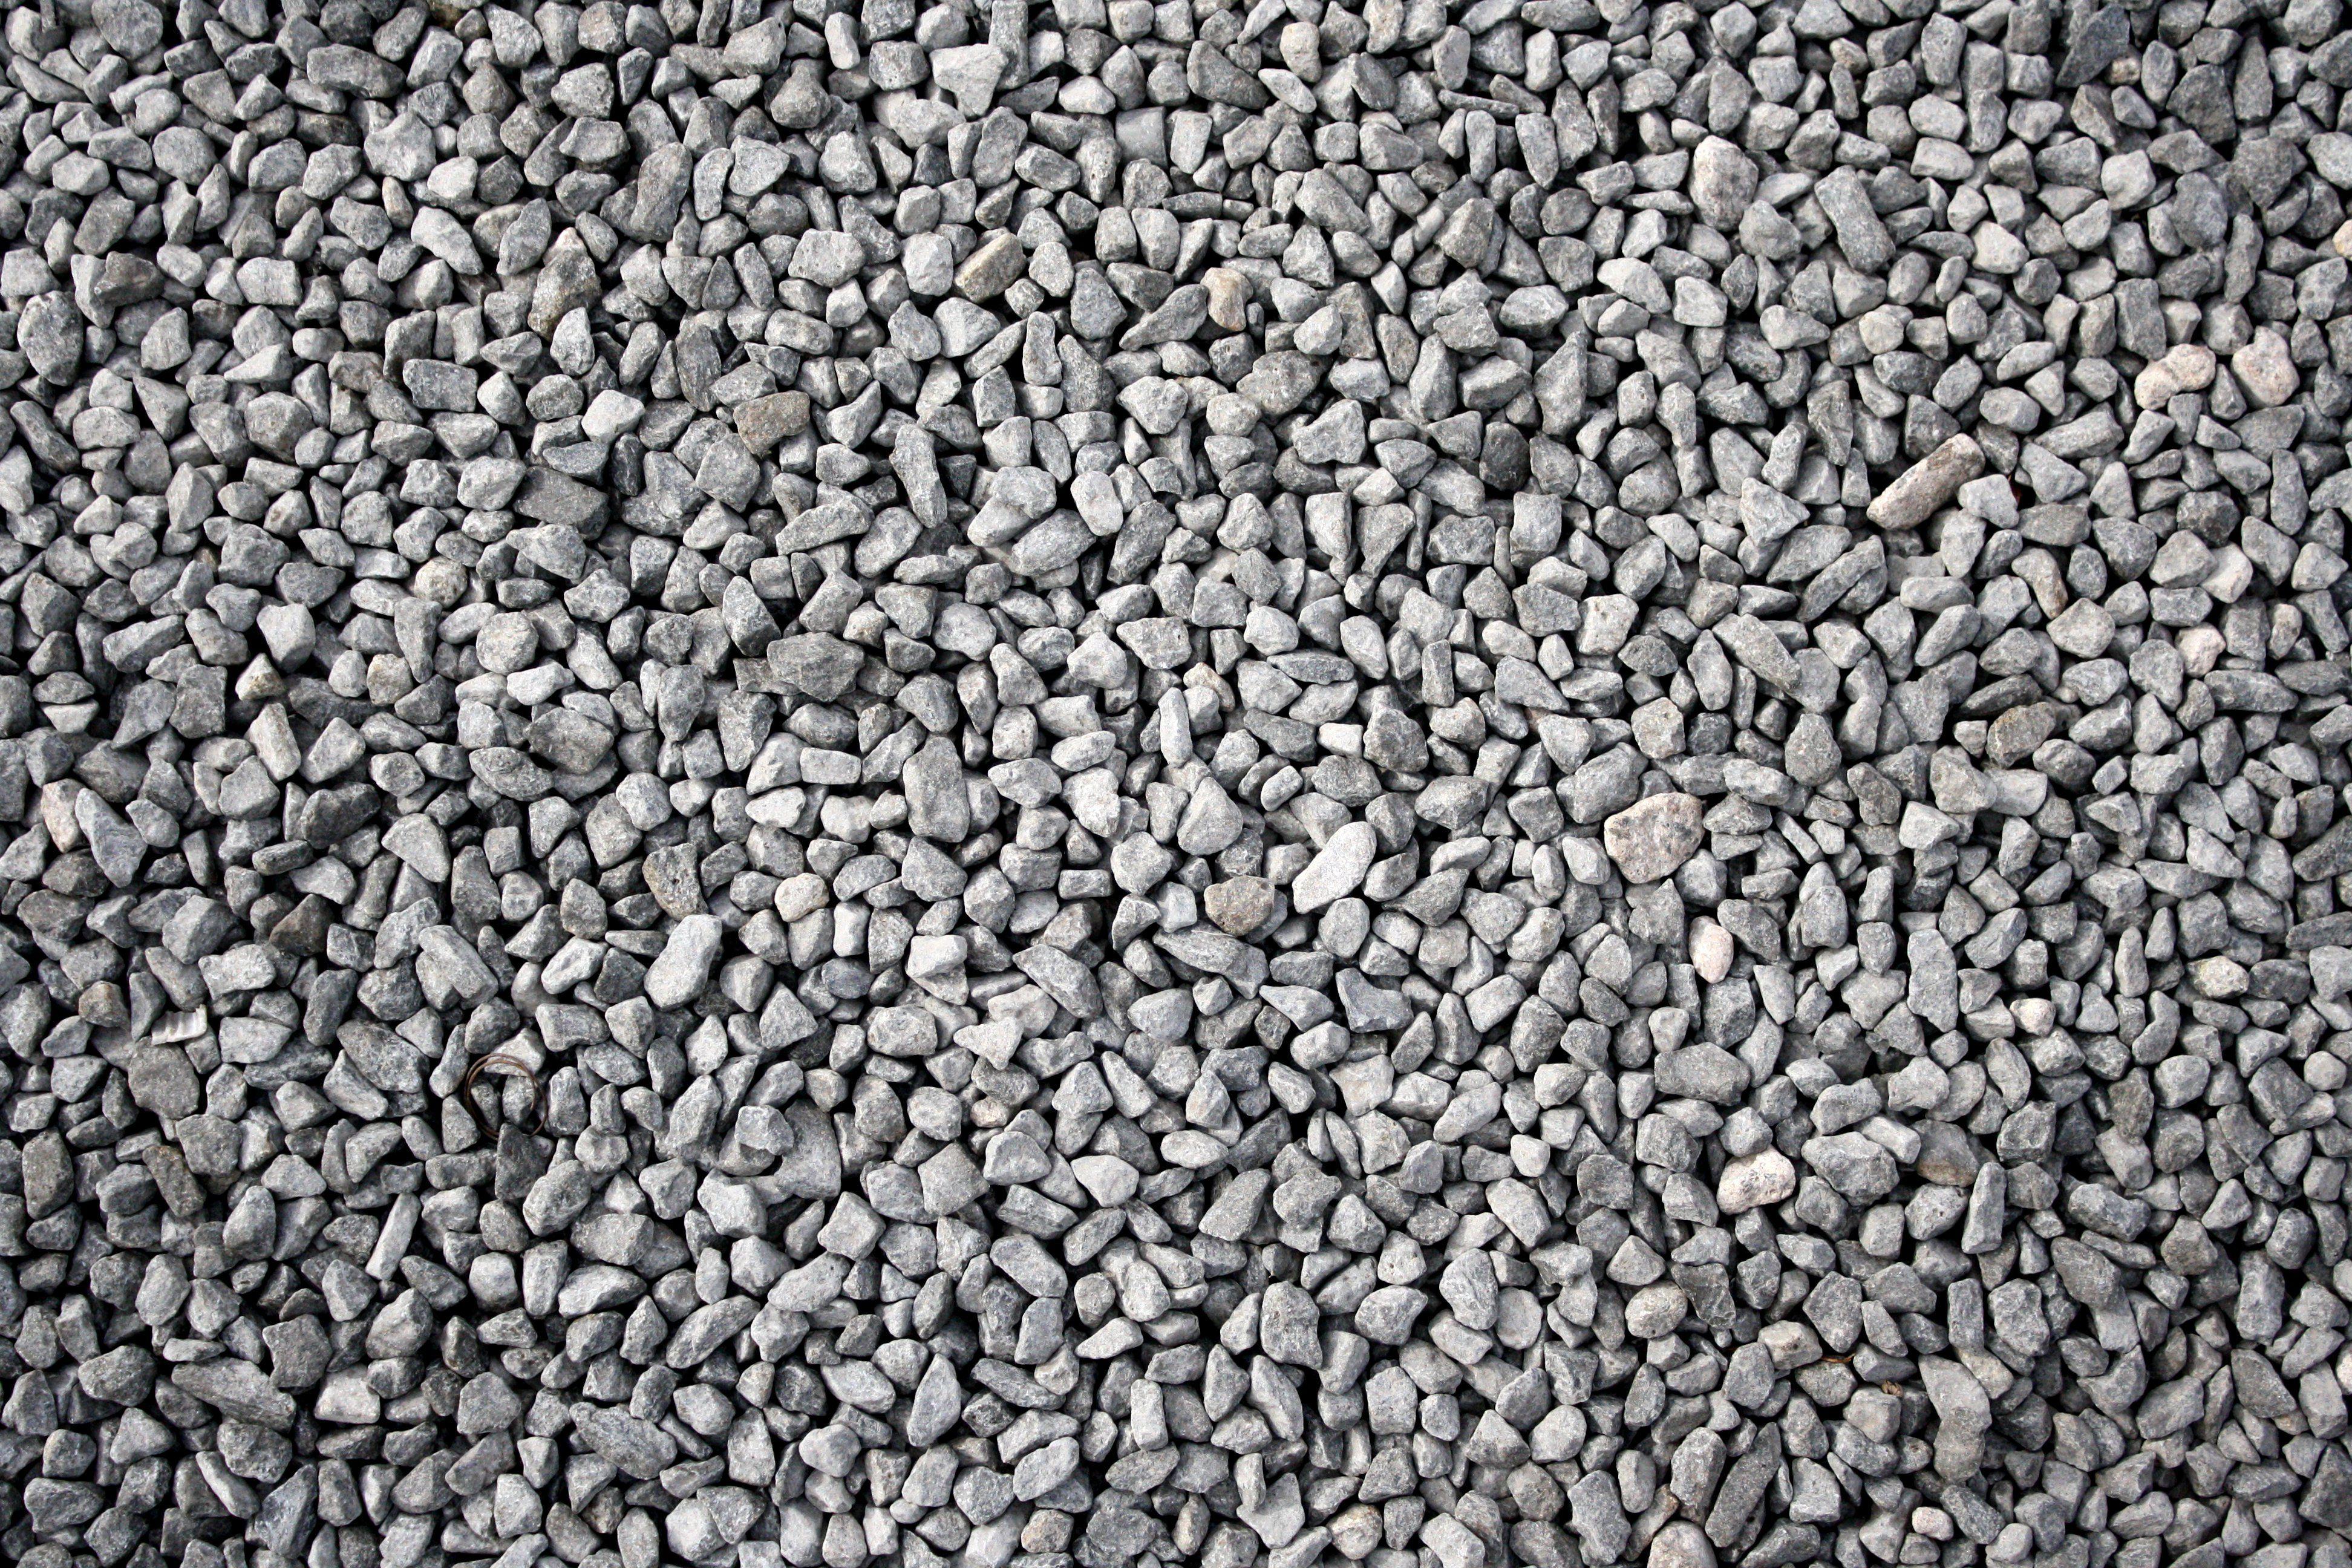 Gray Gravel Rock Texture Backgrounds Pinterest Wall